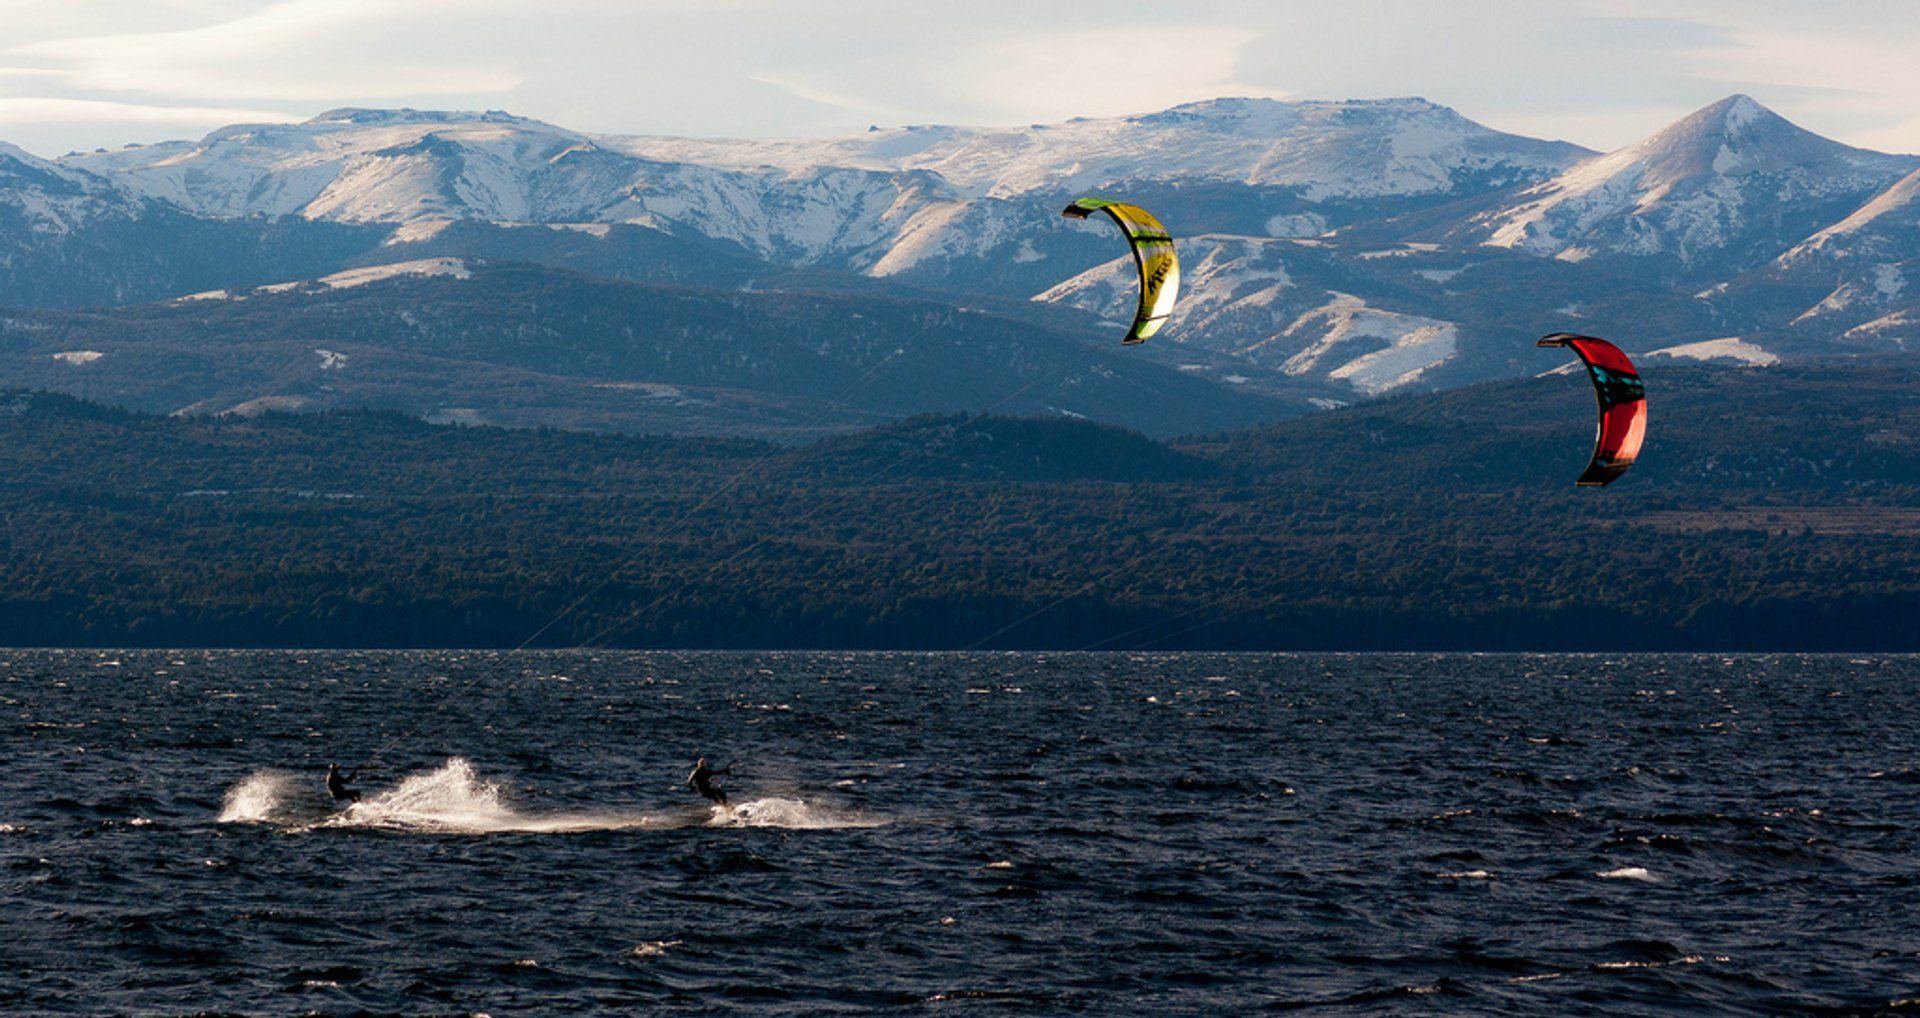 Kitesurfing on Nahuel Huapi in Argentina 2019 - Best Time